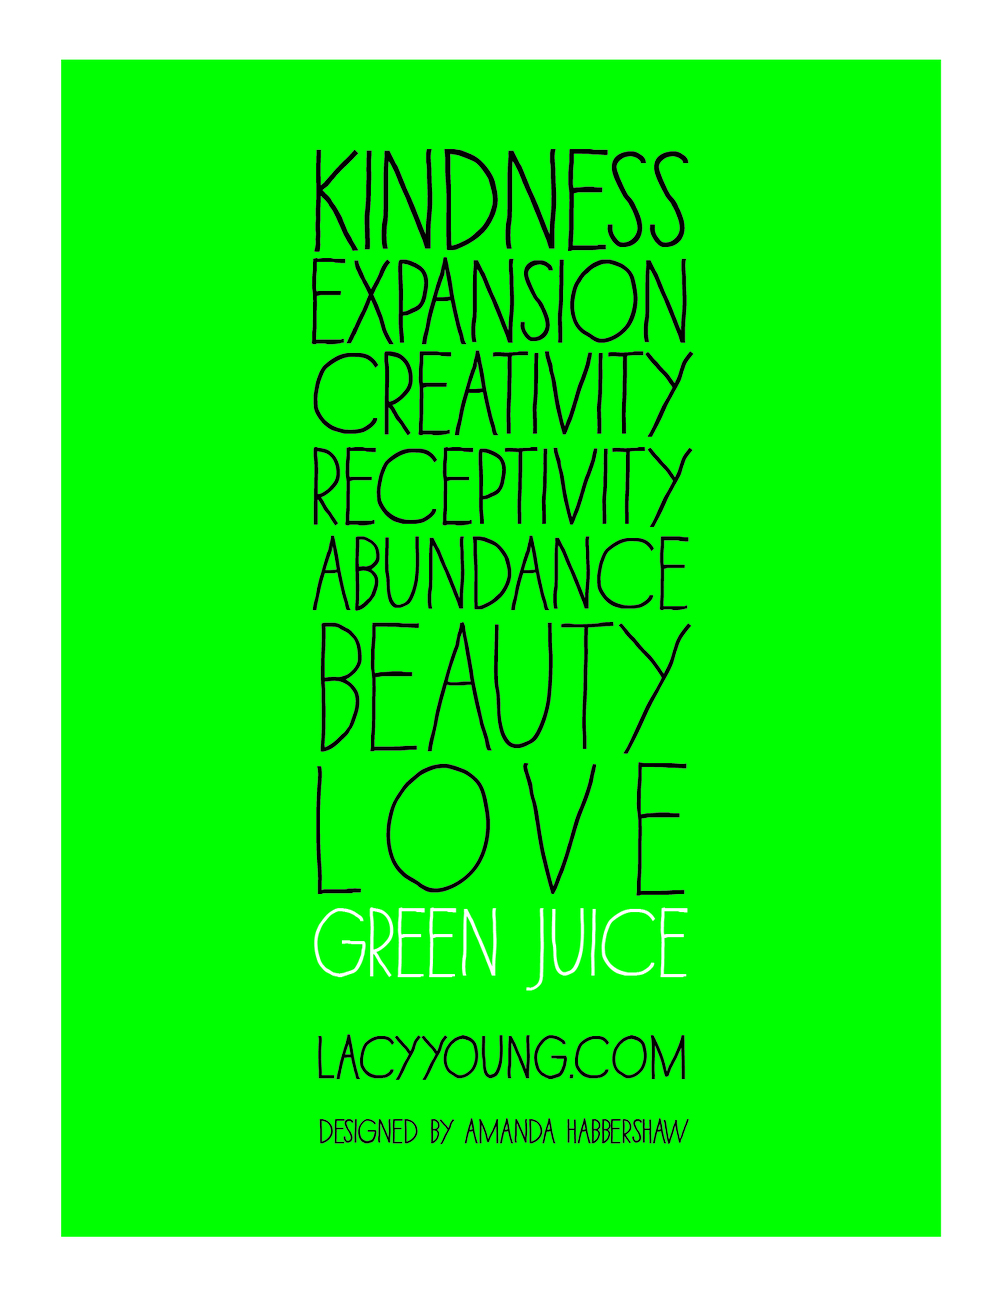 + green juice